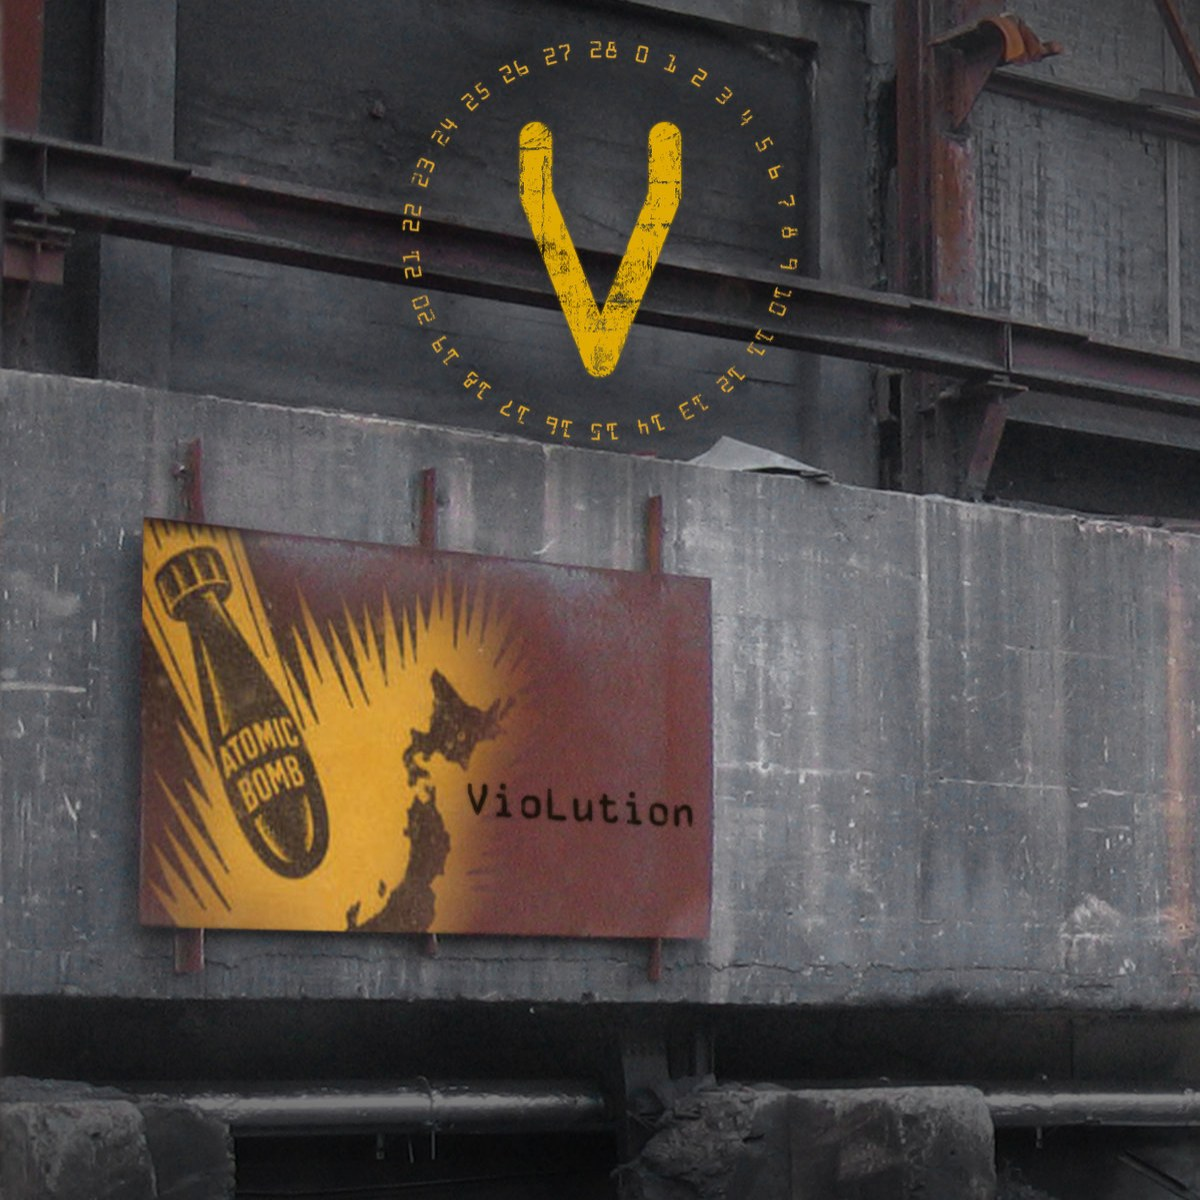 V:28 - VioLution